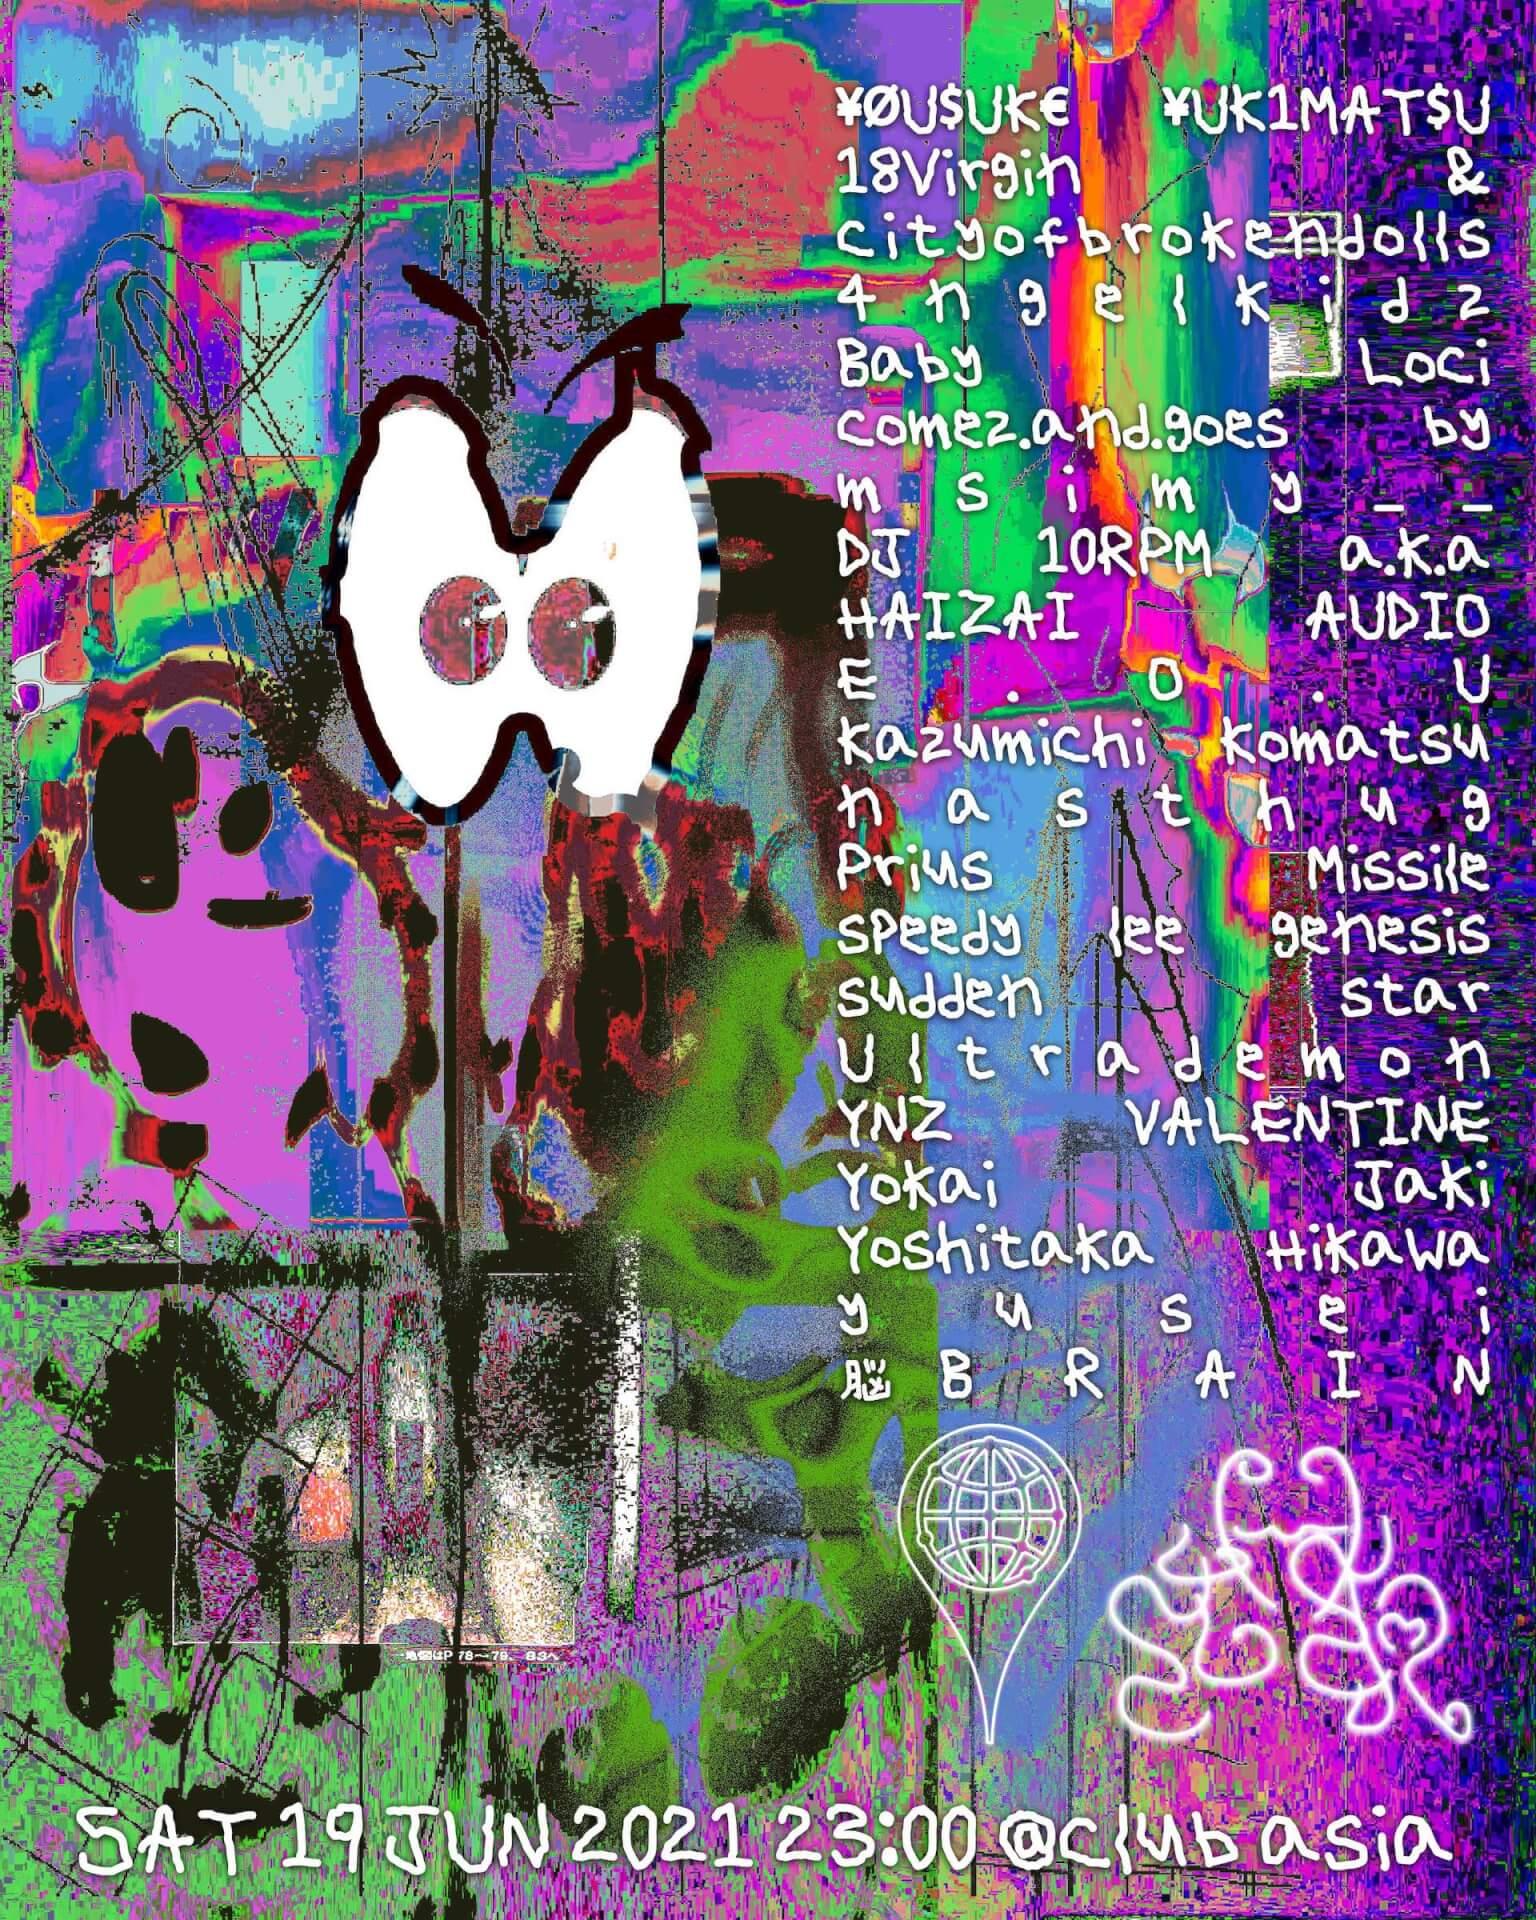 Ultrademon、Yokai Jaki、E.O.U、Kazumichi Komatsu等を迎え現行ユースカルチャーが入り乱れる多様なムードのLocal Worldが開催! music210603_localworld_ether2